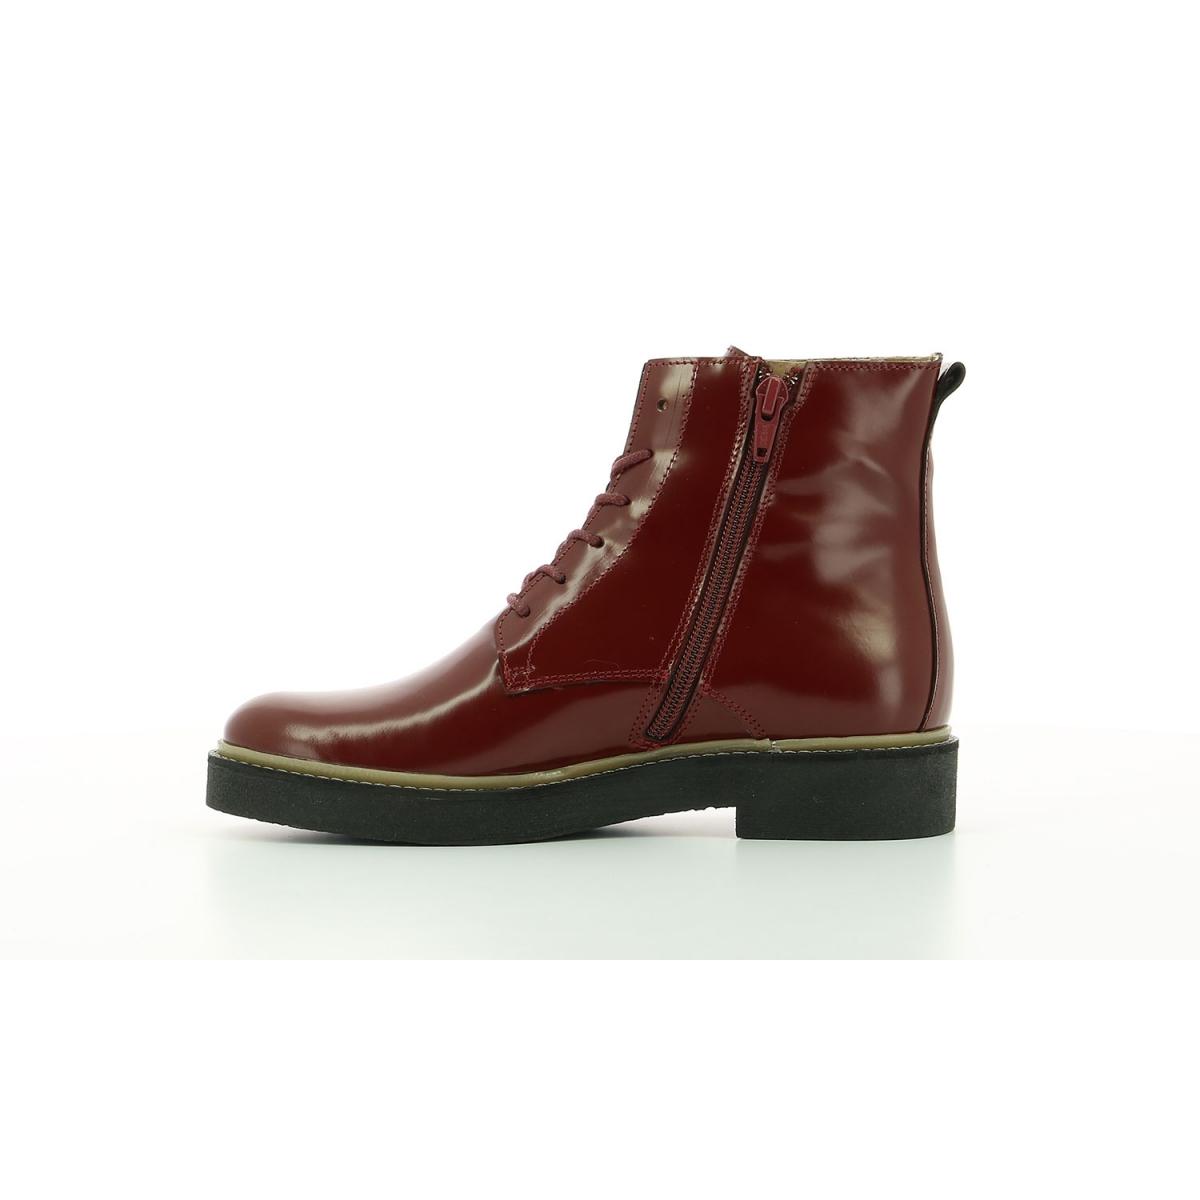 Boots Femme Oxigeno rouge foncé Chaussures Femme Kickers